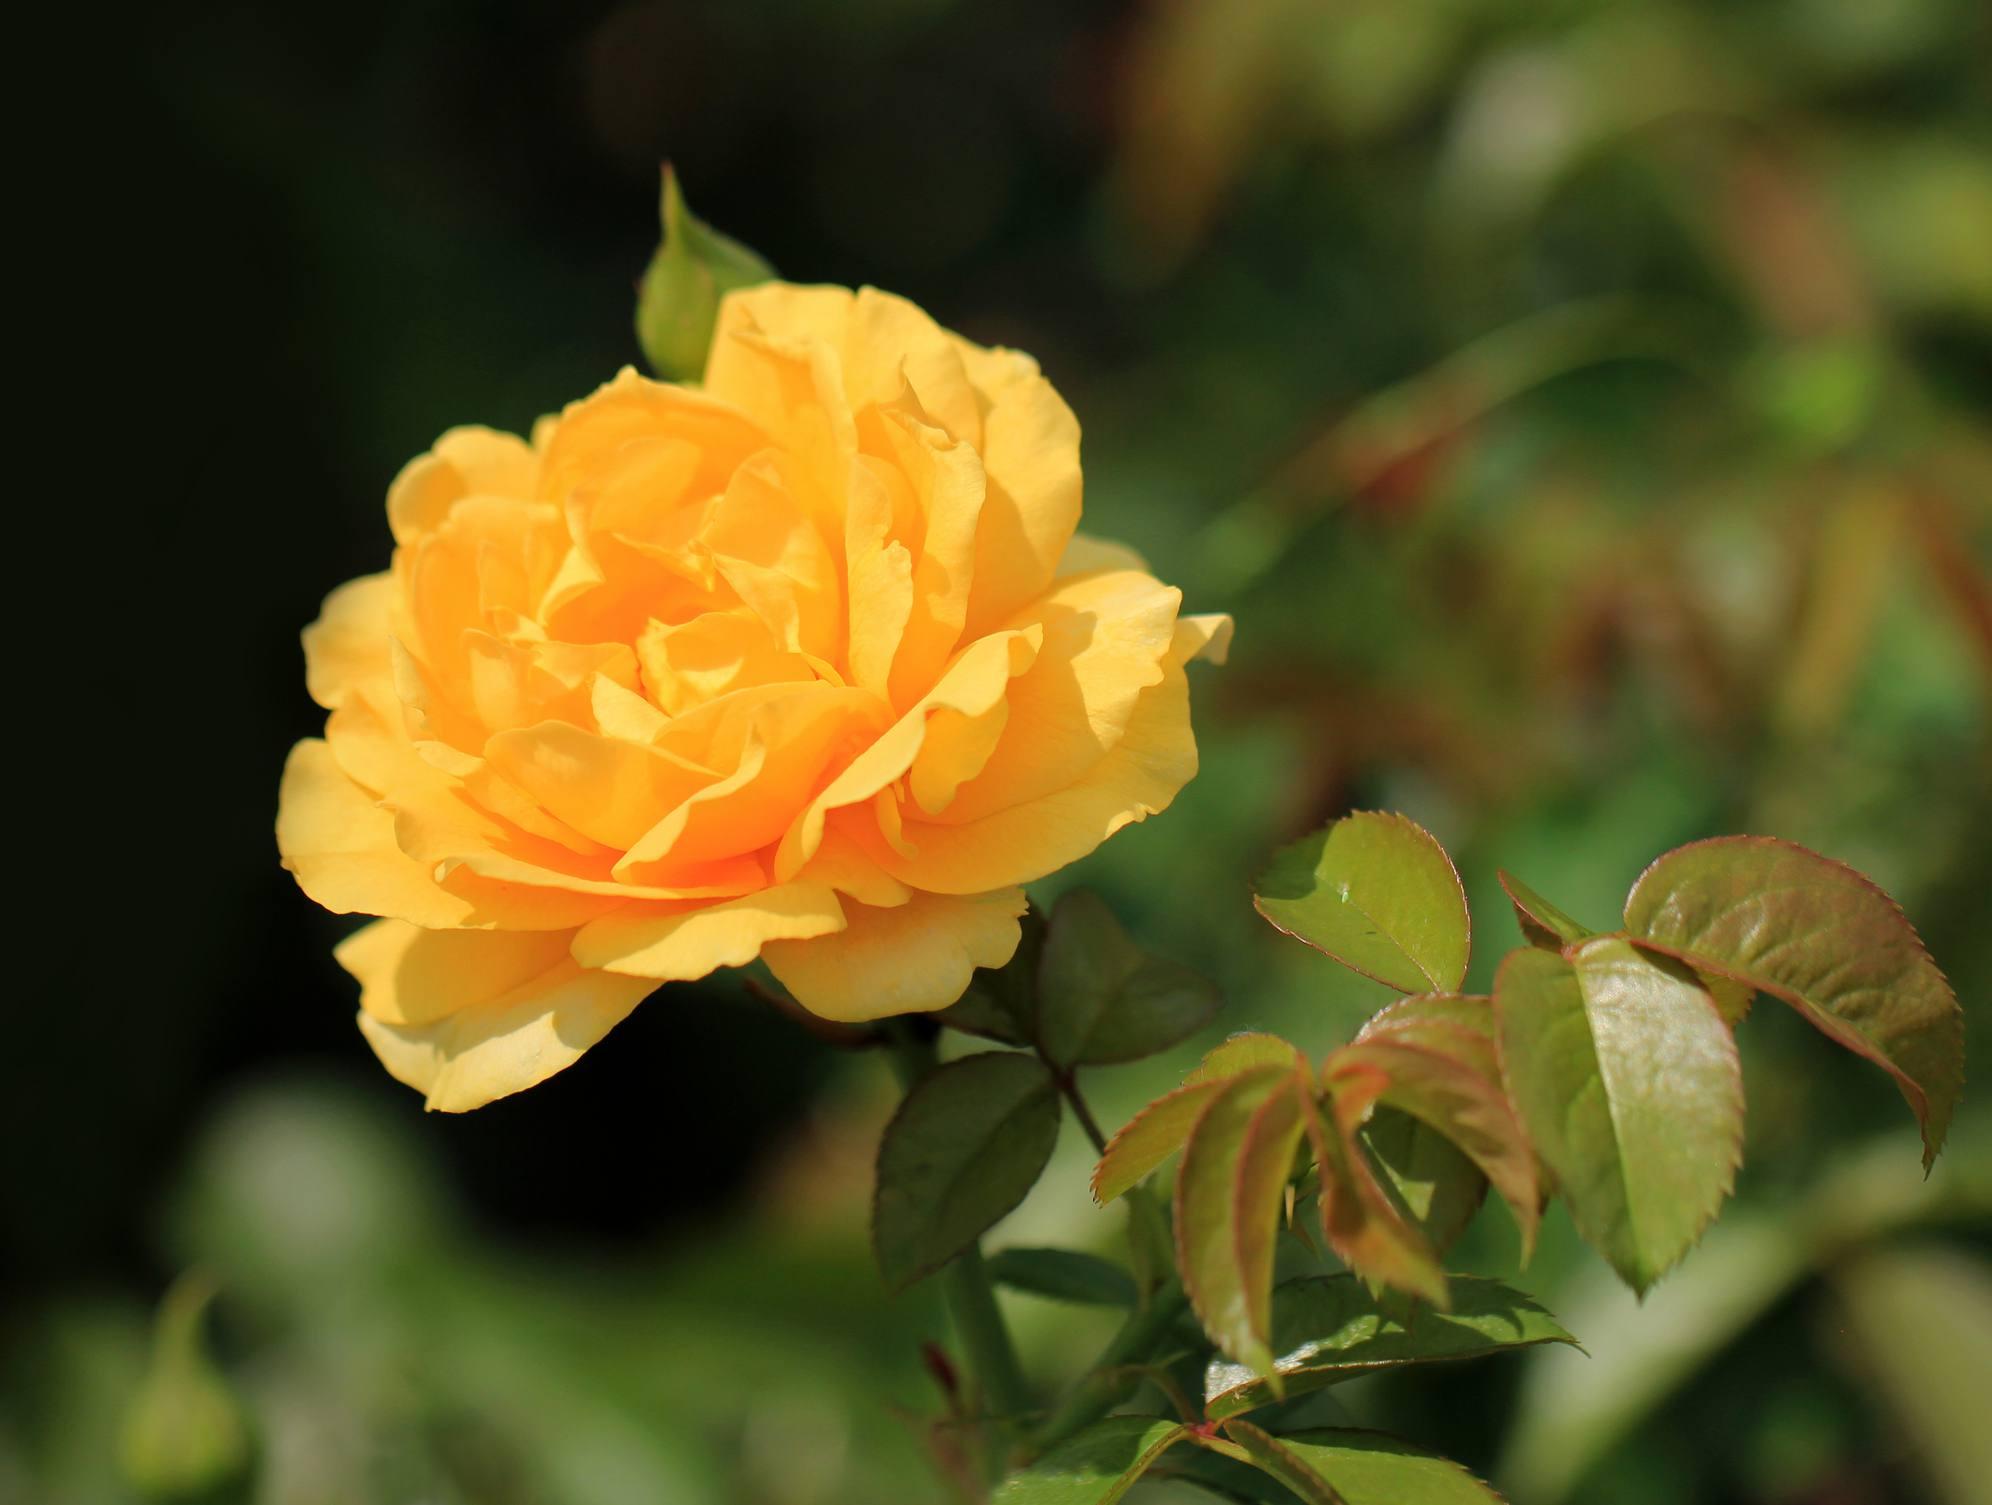 'Julia Child' floribunda rose with yellow petals